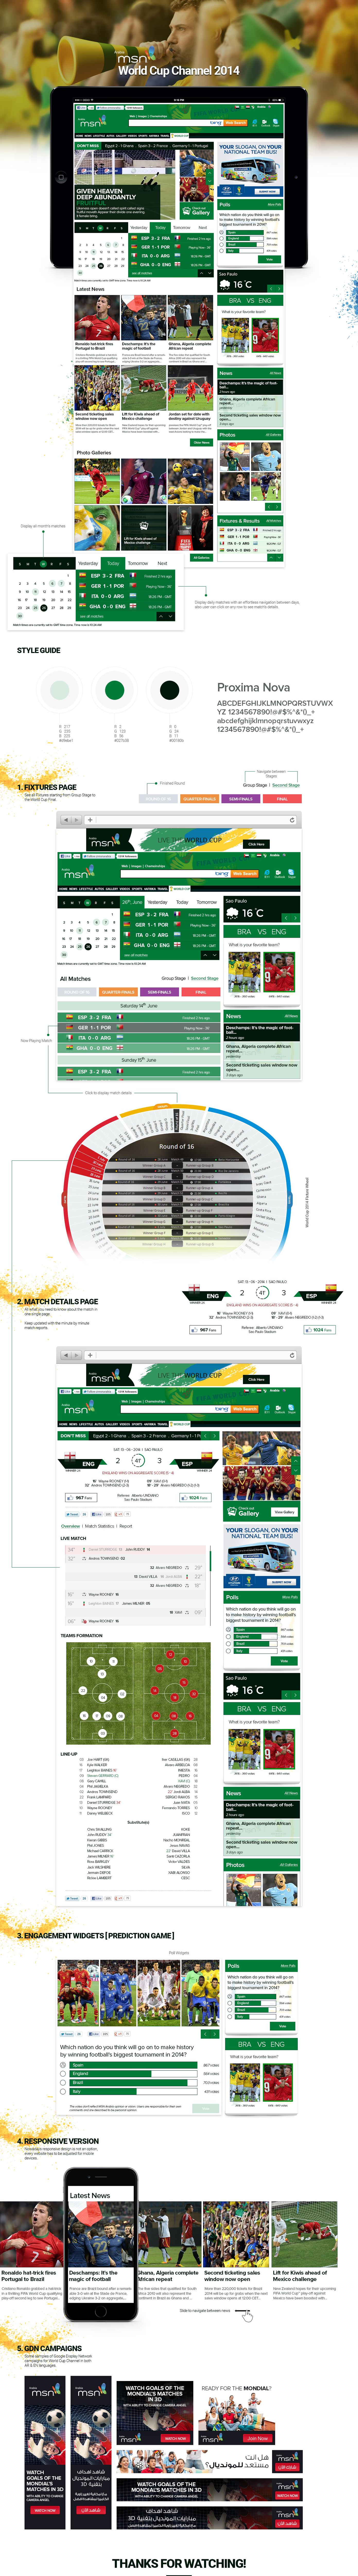 UI ux Website msn soccer FIFA world cup football sports Channel GDN msn arabia Brazil Brasil